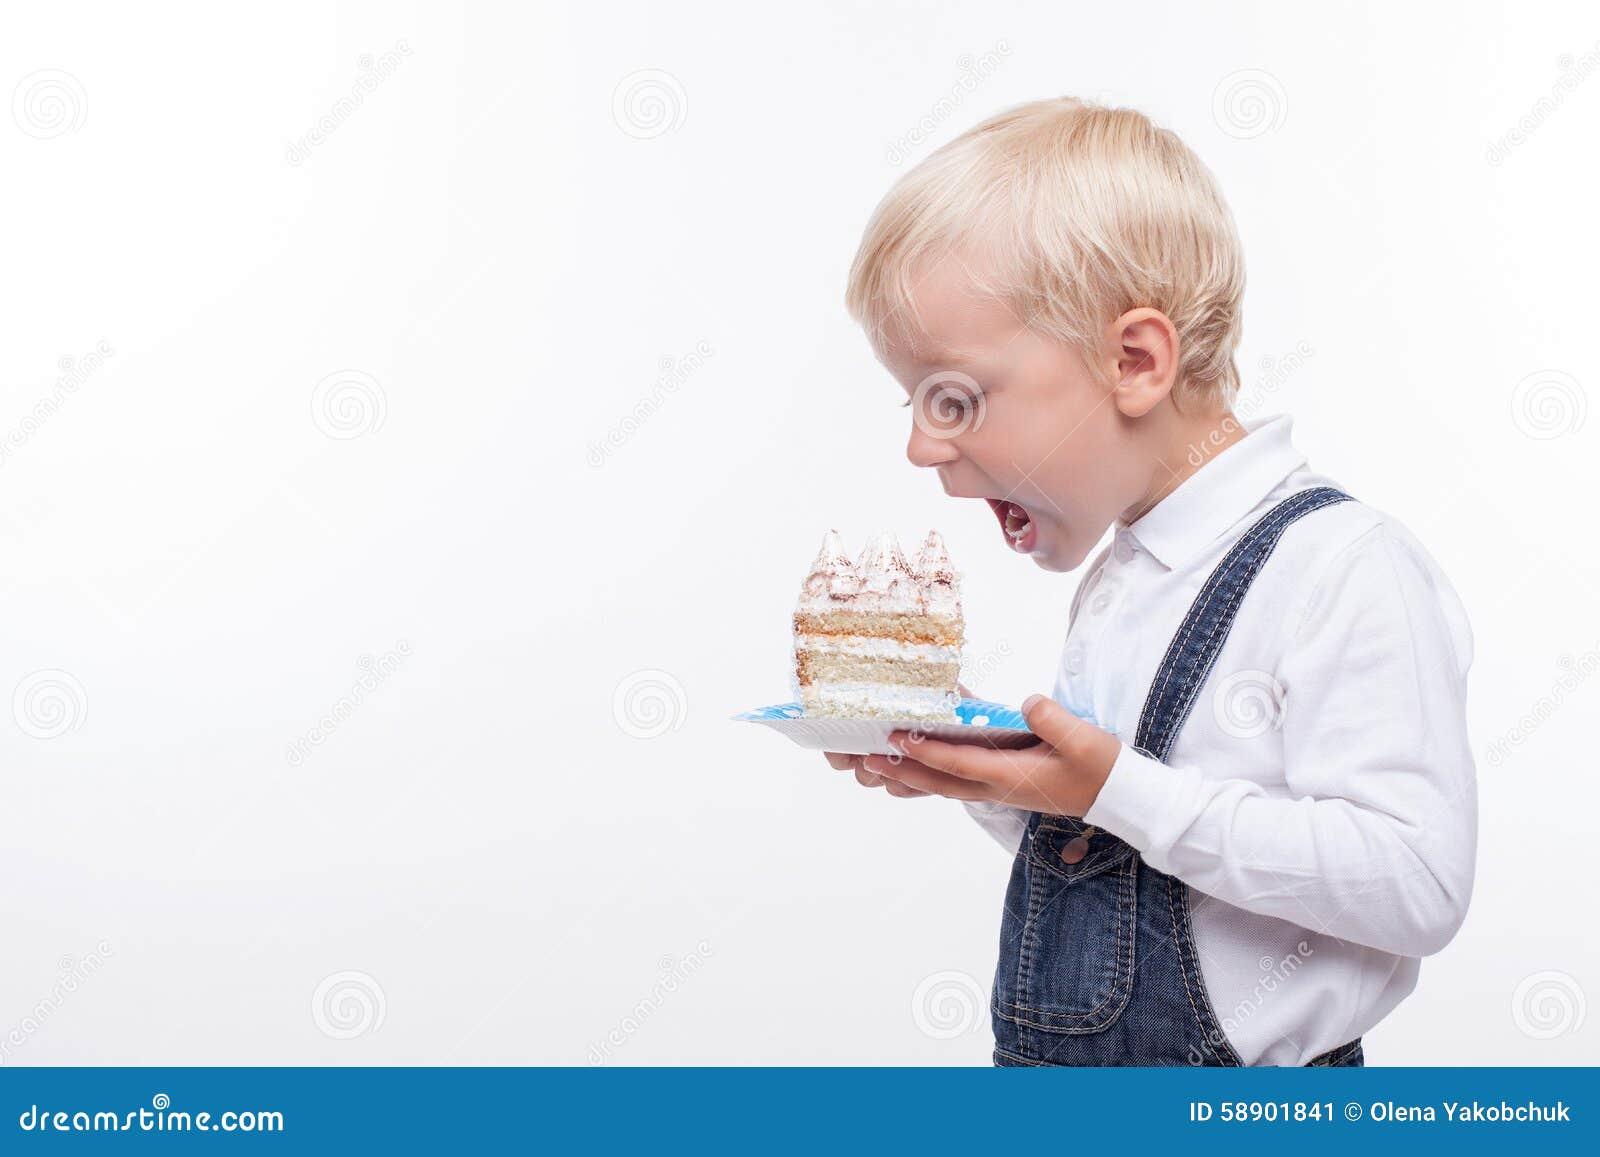 Pretty male child is tasting sweet food